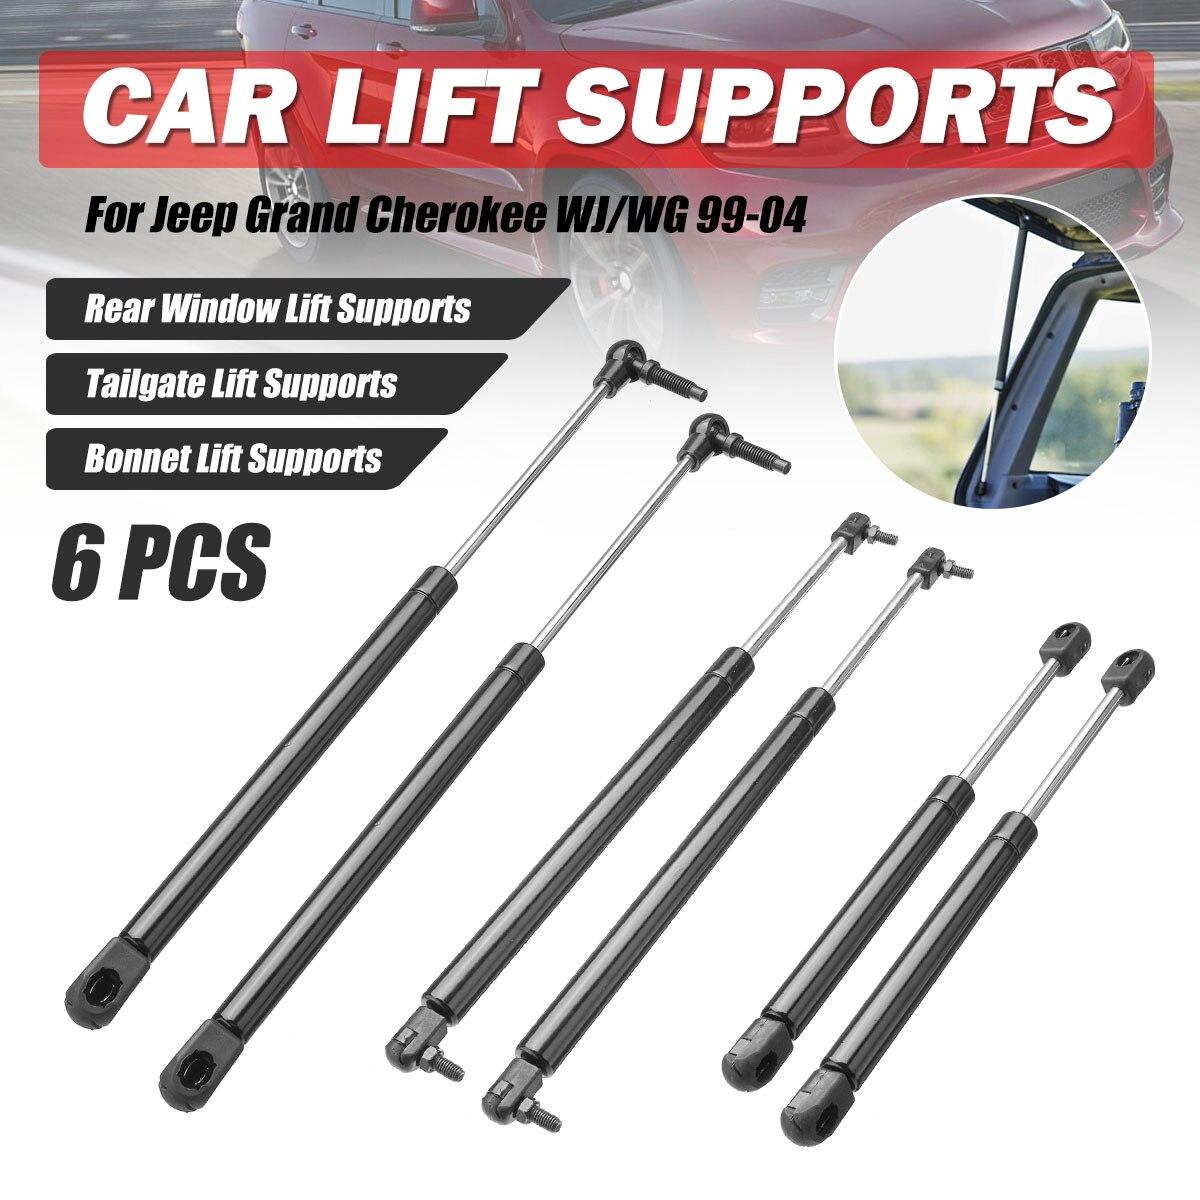 WG// WJ 1999-2004 4X4 GAS BONNET SUPPORT STRUTS 2X FOR JEEP GRAND CHEROKEE